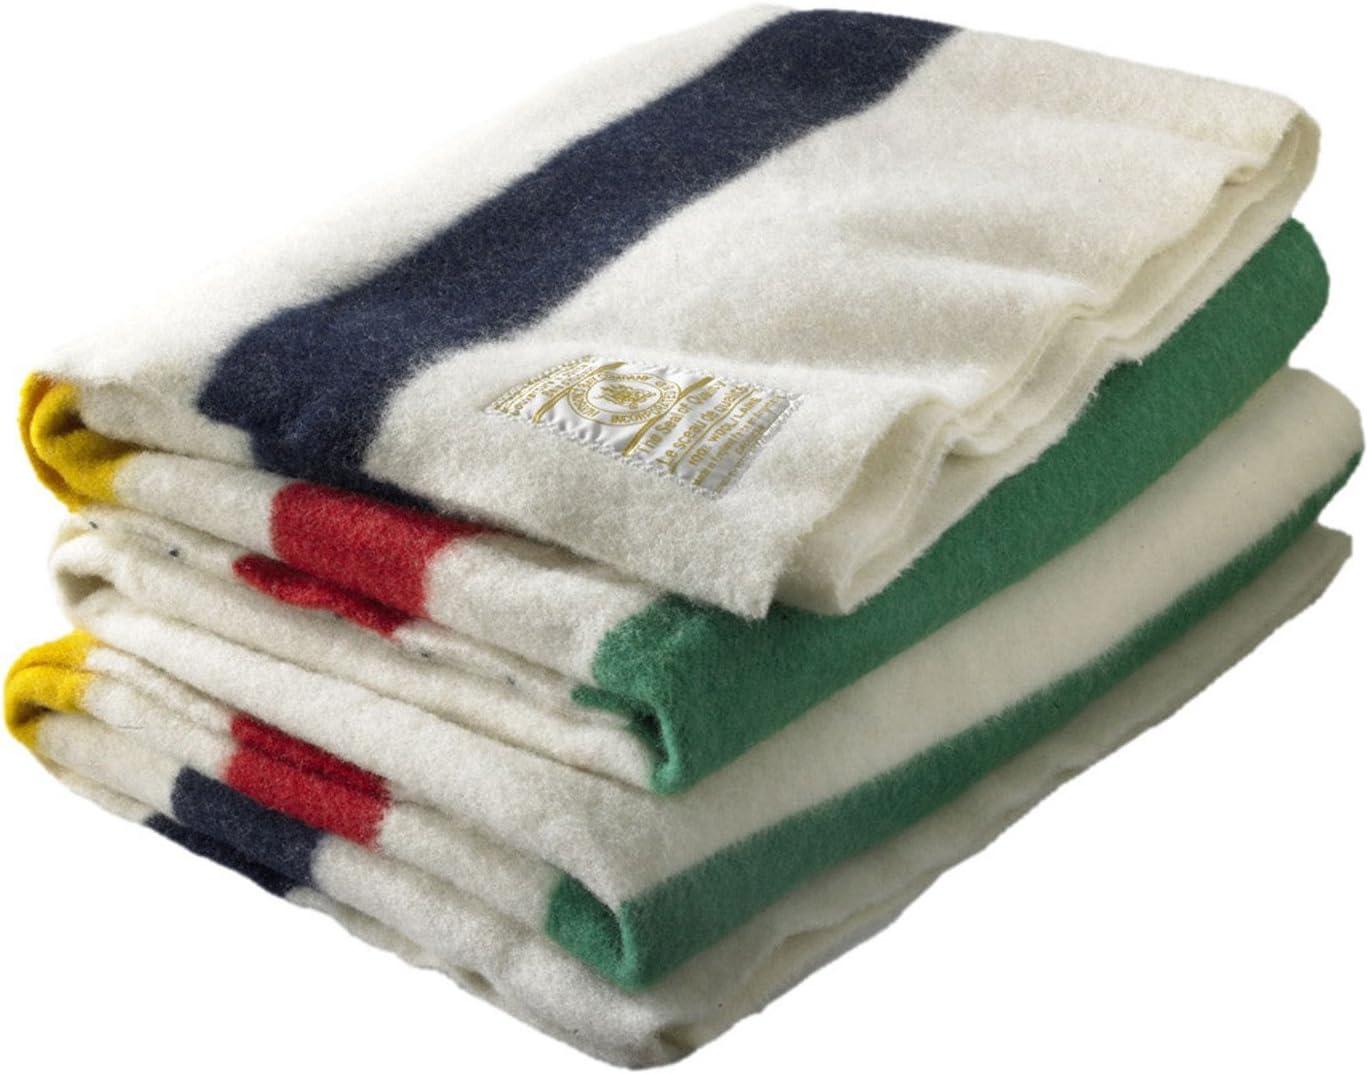 HUDSONS BAY Polar Fleece Throw One Size Multi Stripe